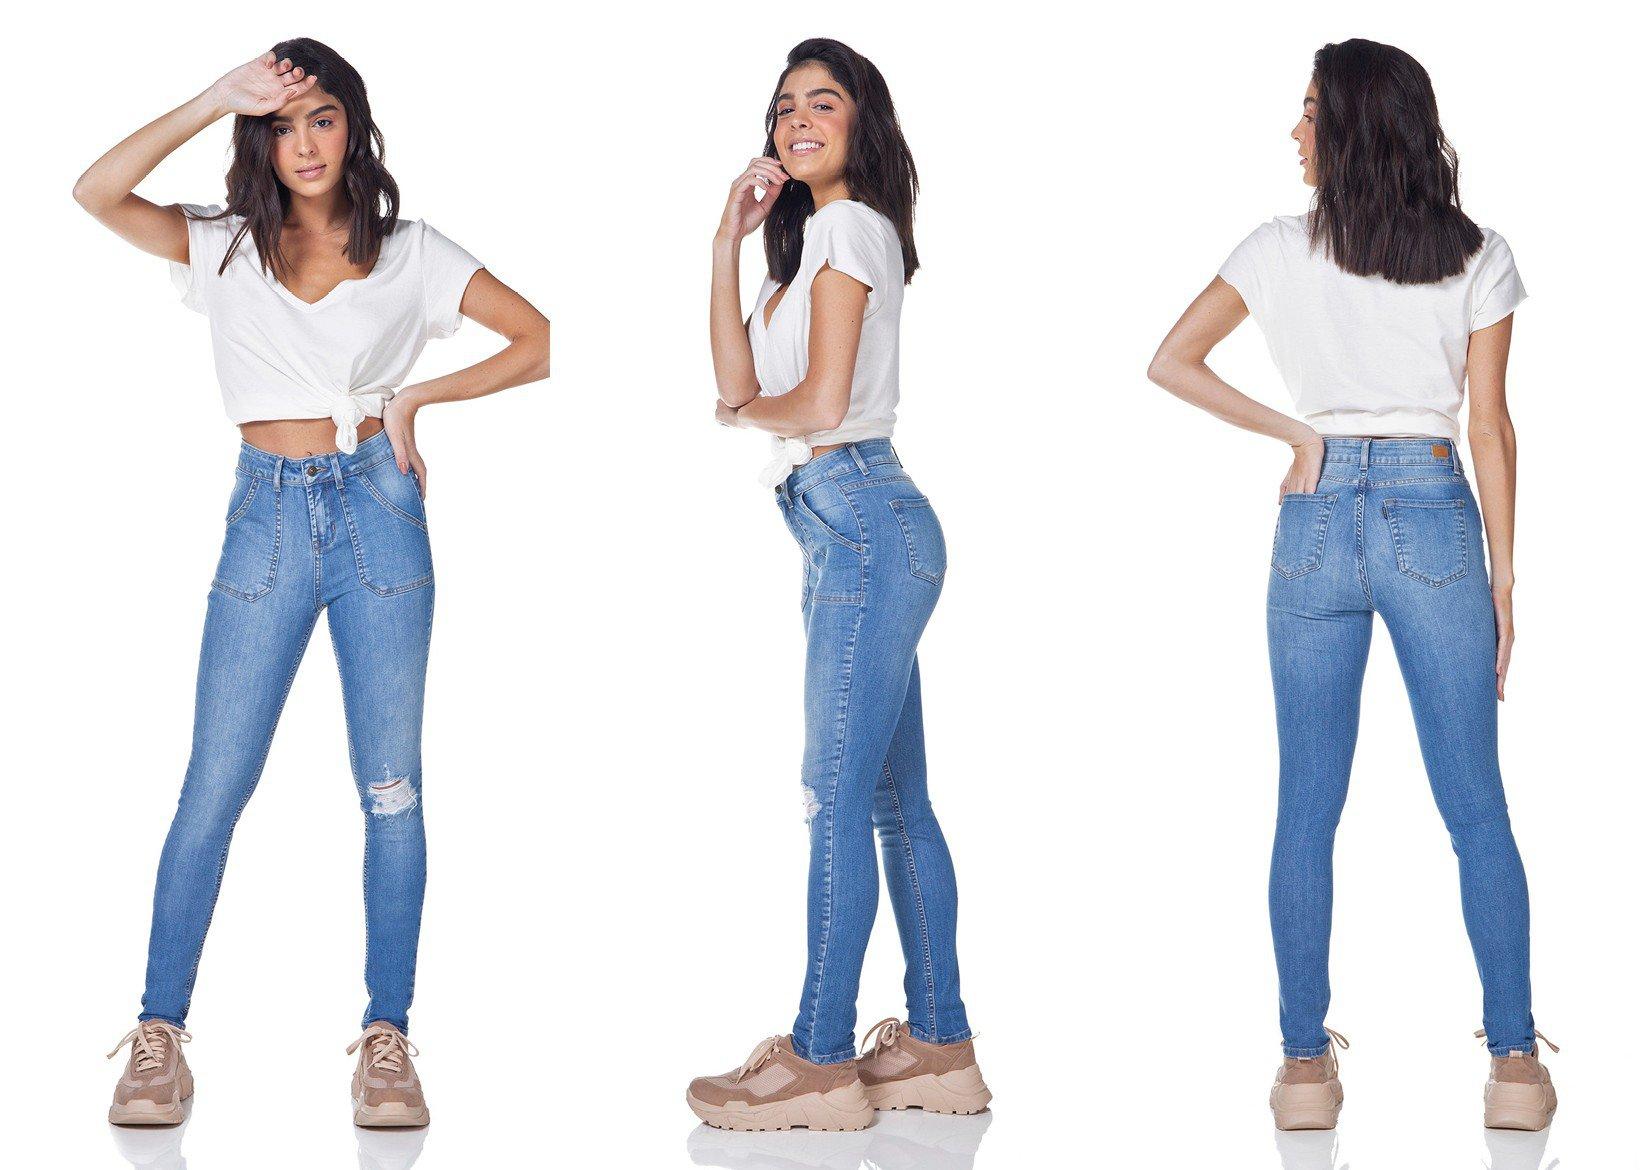 dz3148 calca jeans skinny media bolsos sobrepostos denim zero tripla